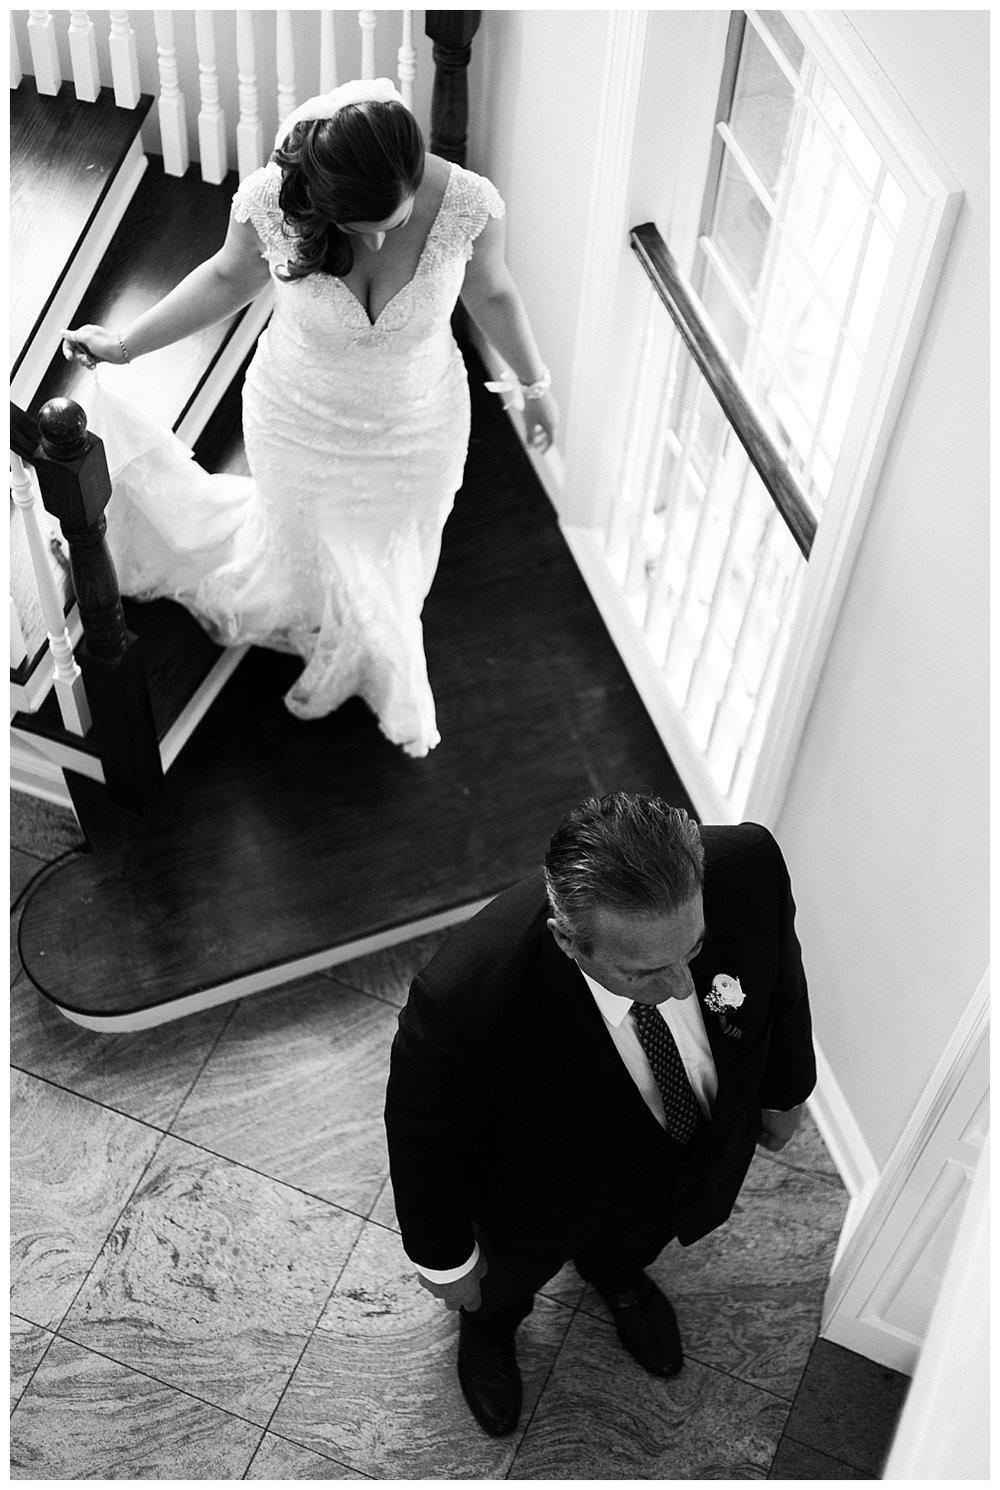 NJ-Wedding-Rock-Island-Lake-Club-Sparta-Navy-Blush-Photographer-Photo-027.JPG